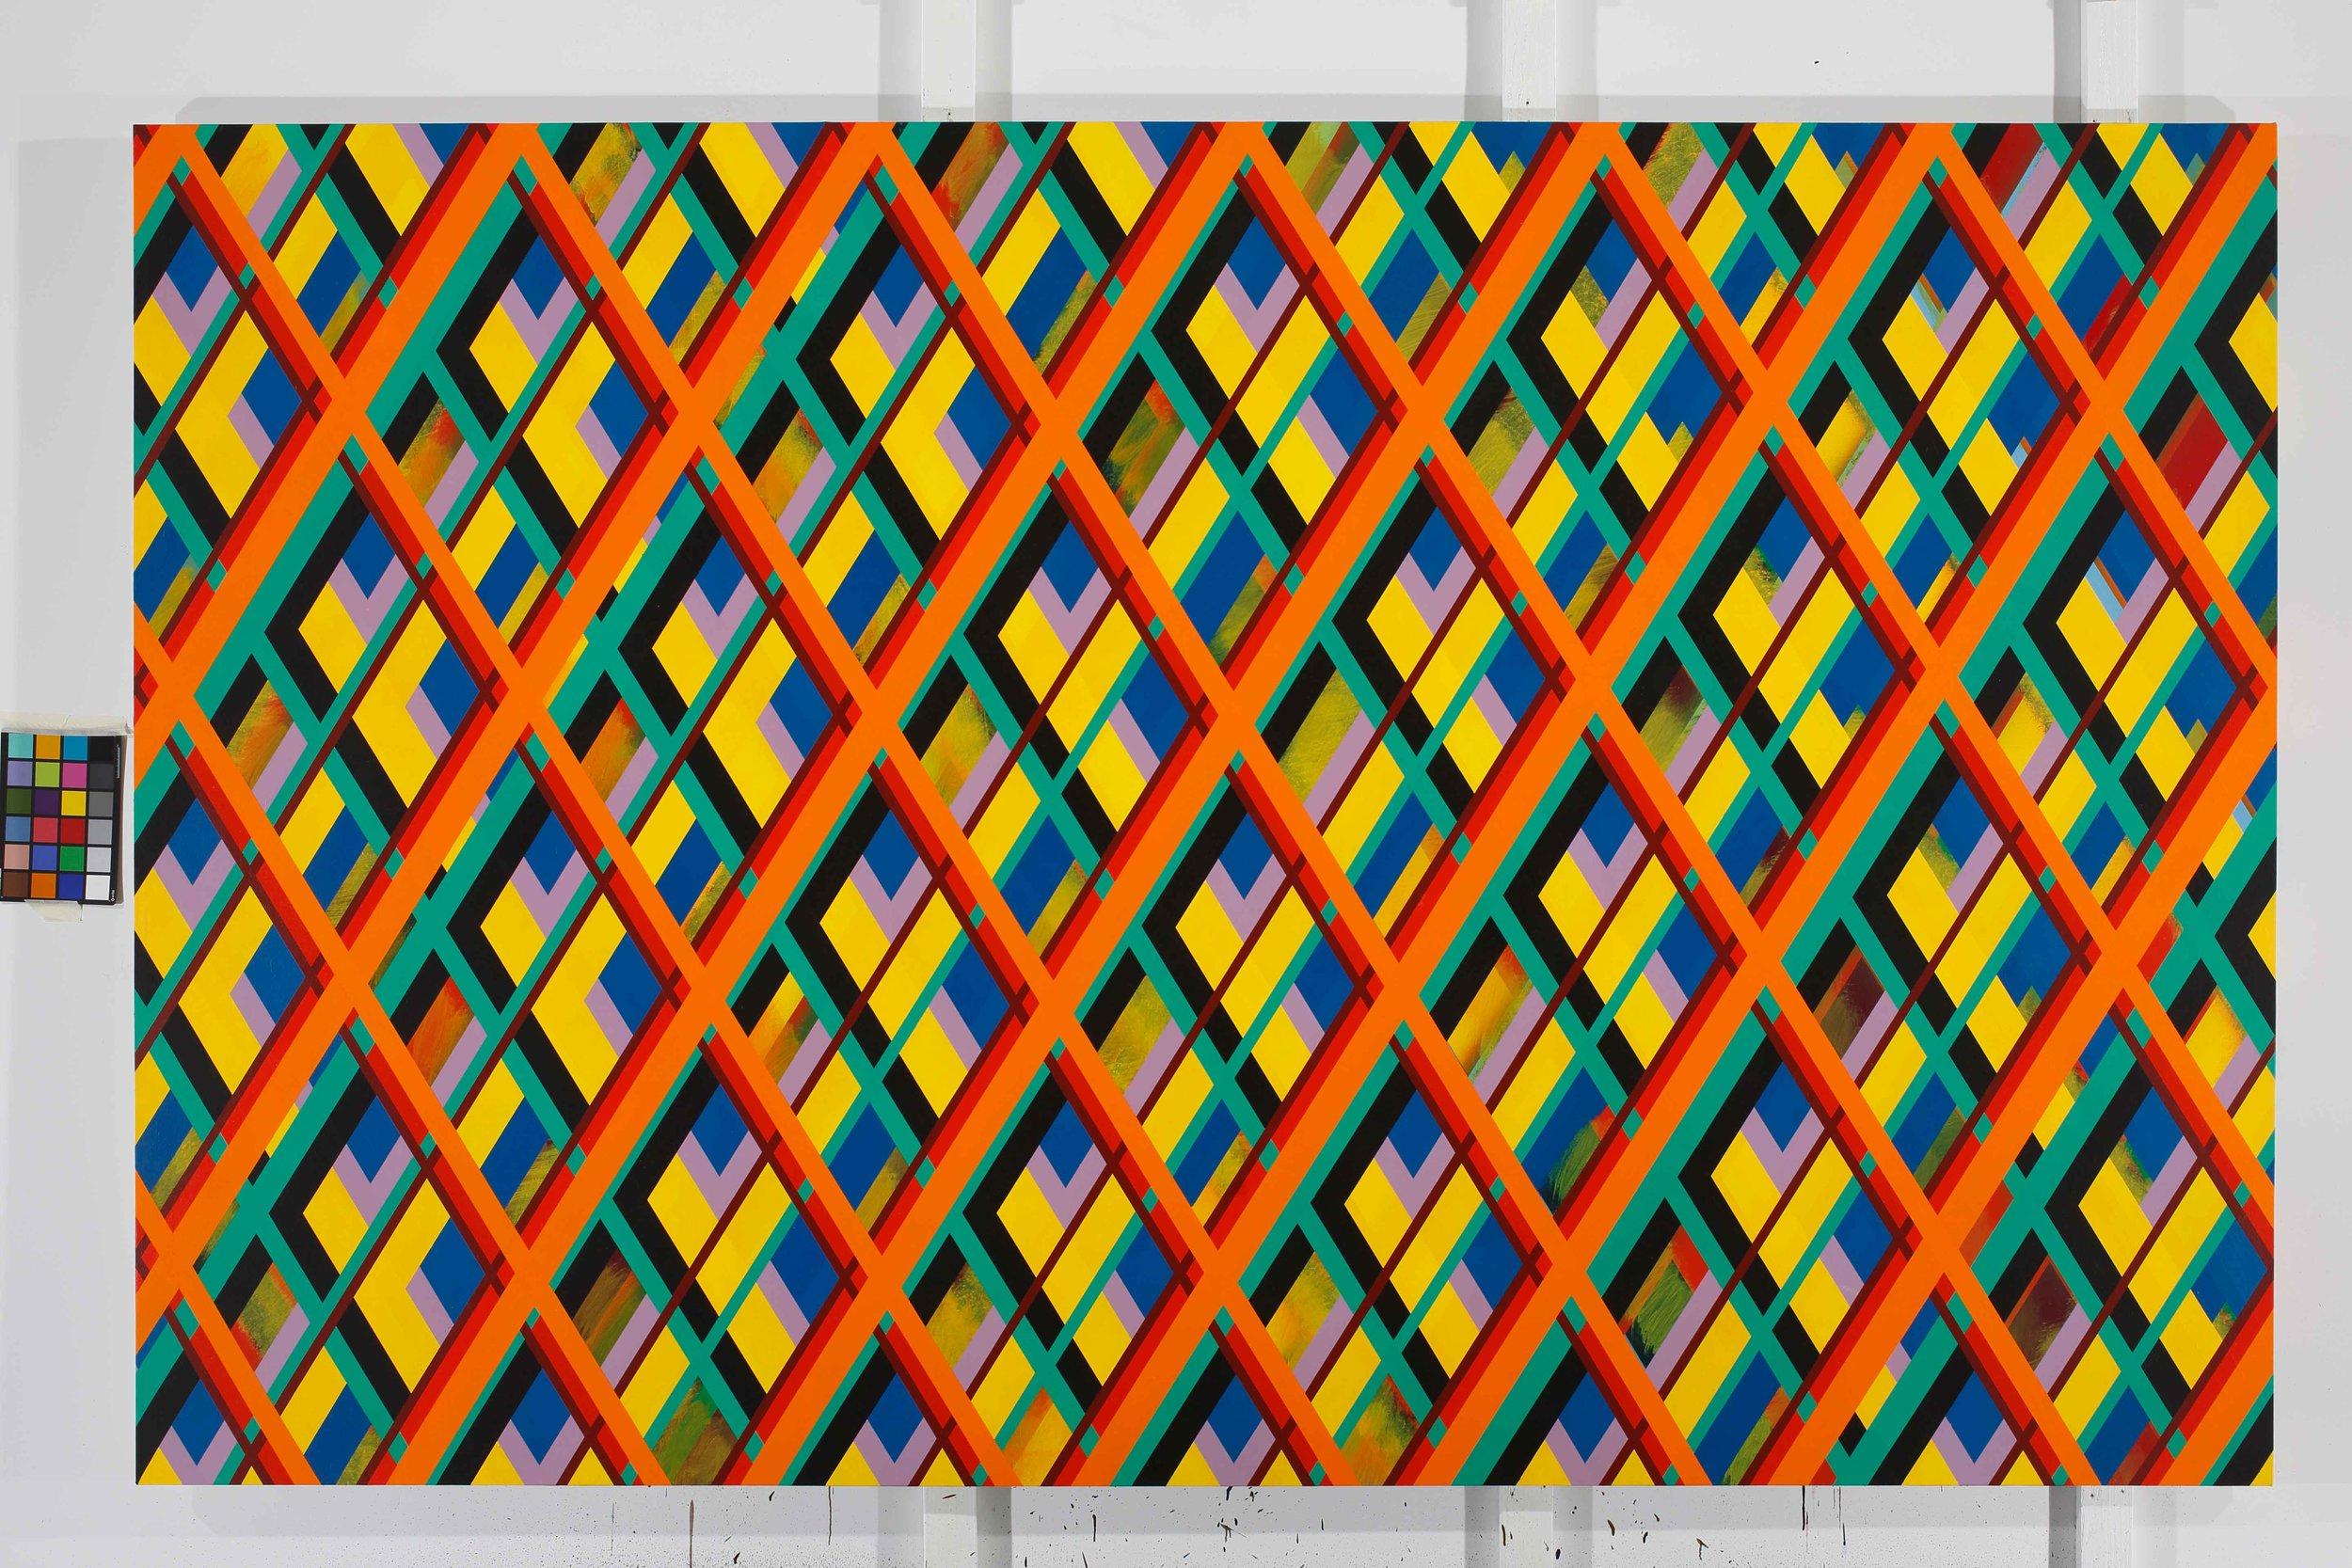 Sean-Scully-Diagonal-Light-1972.jpg